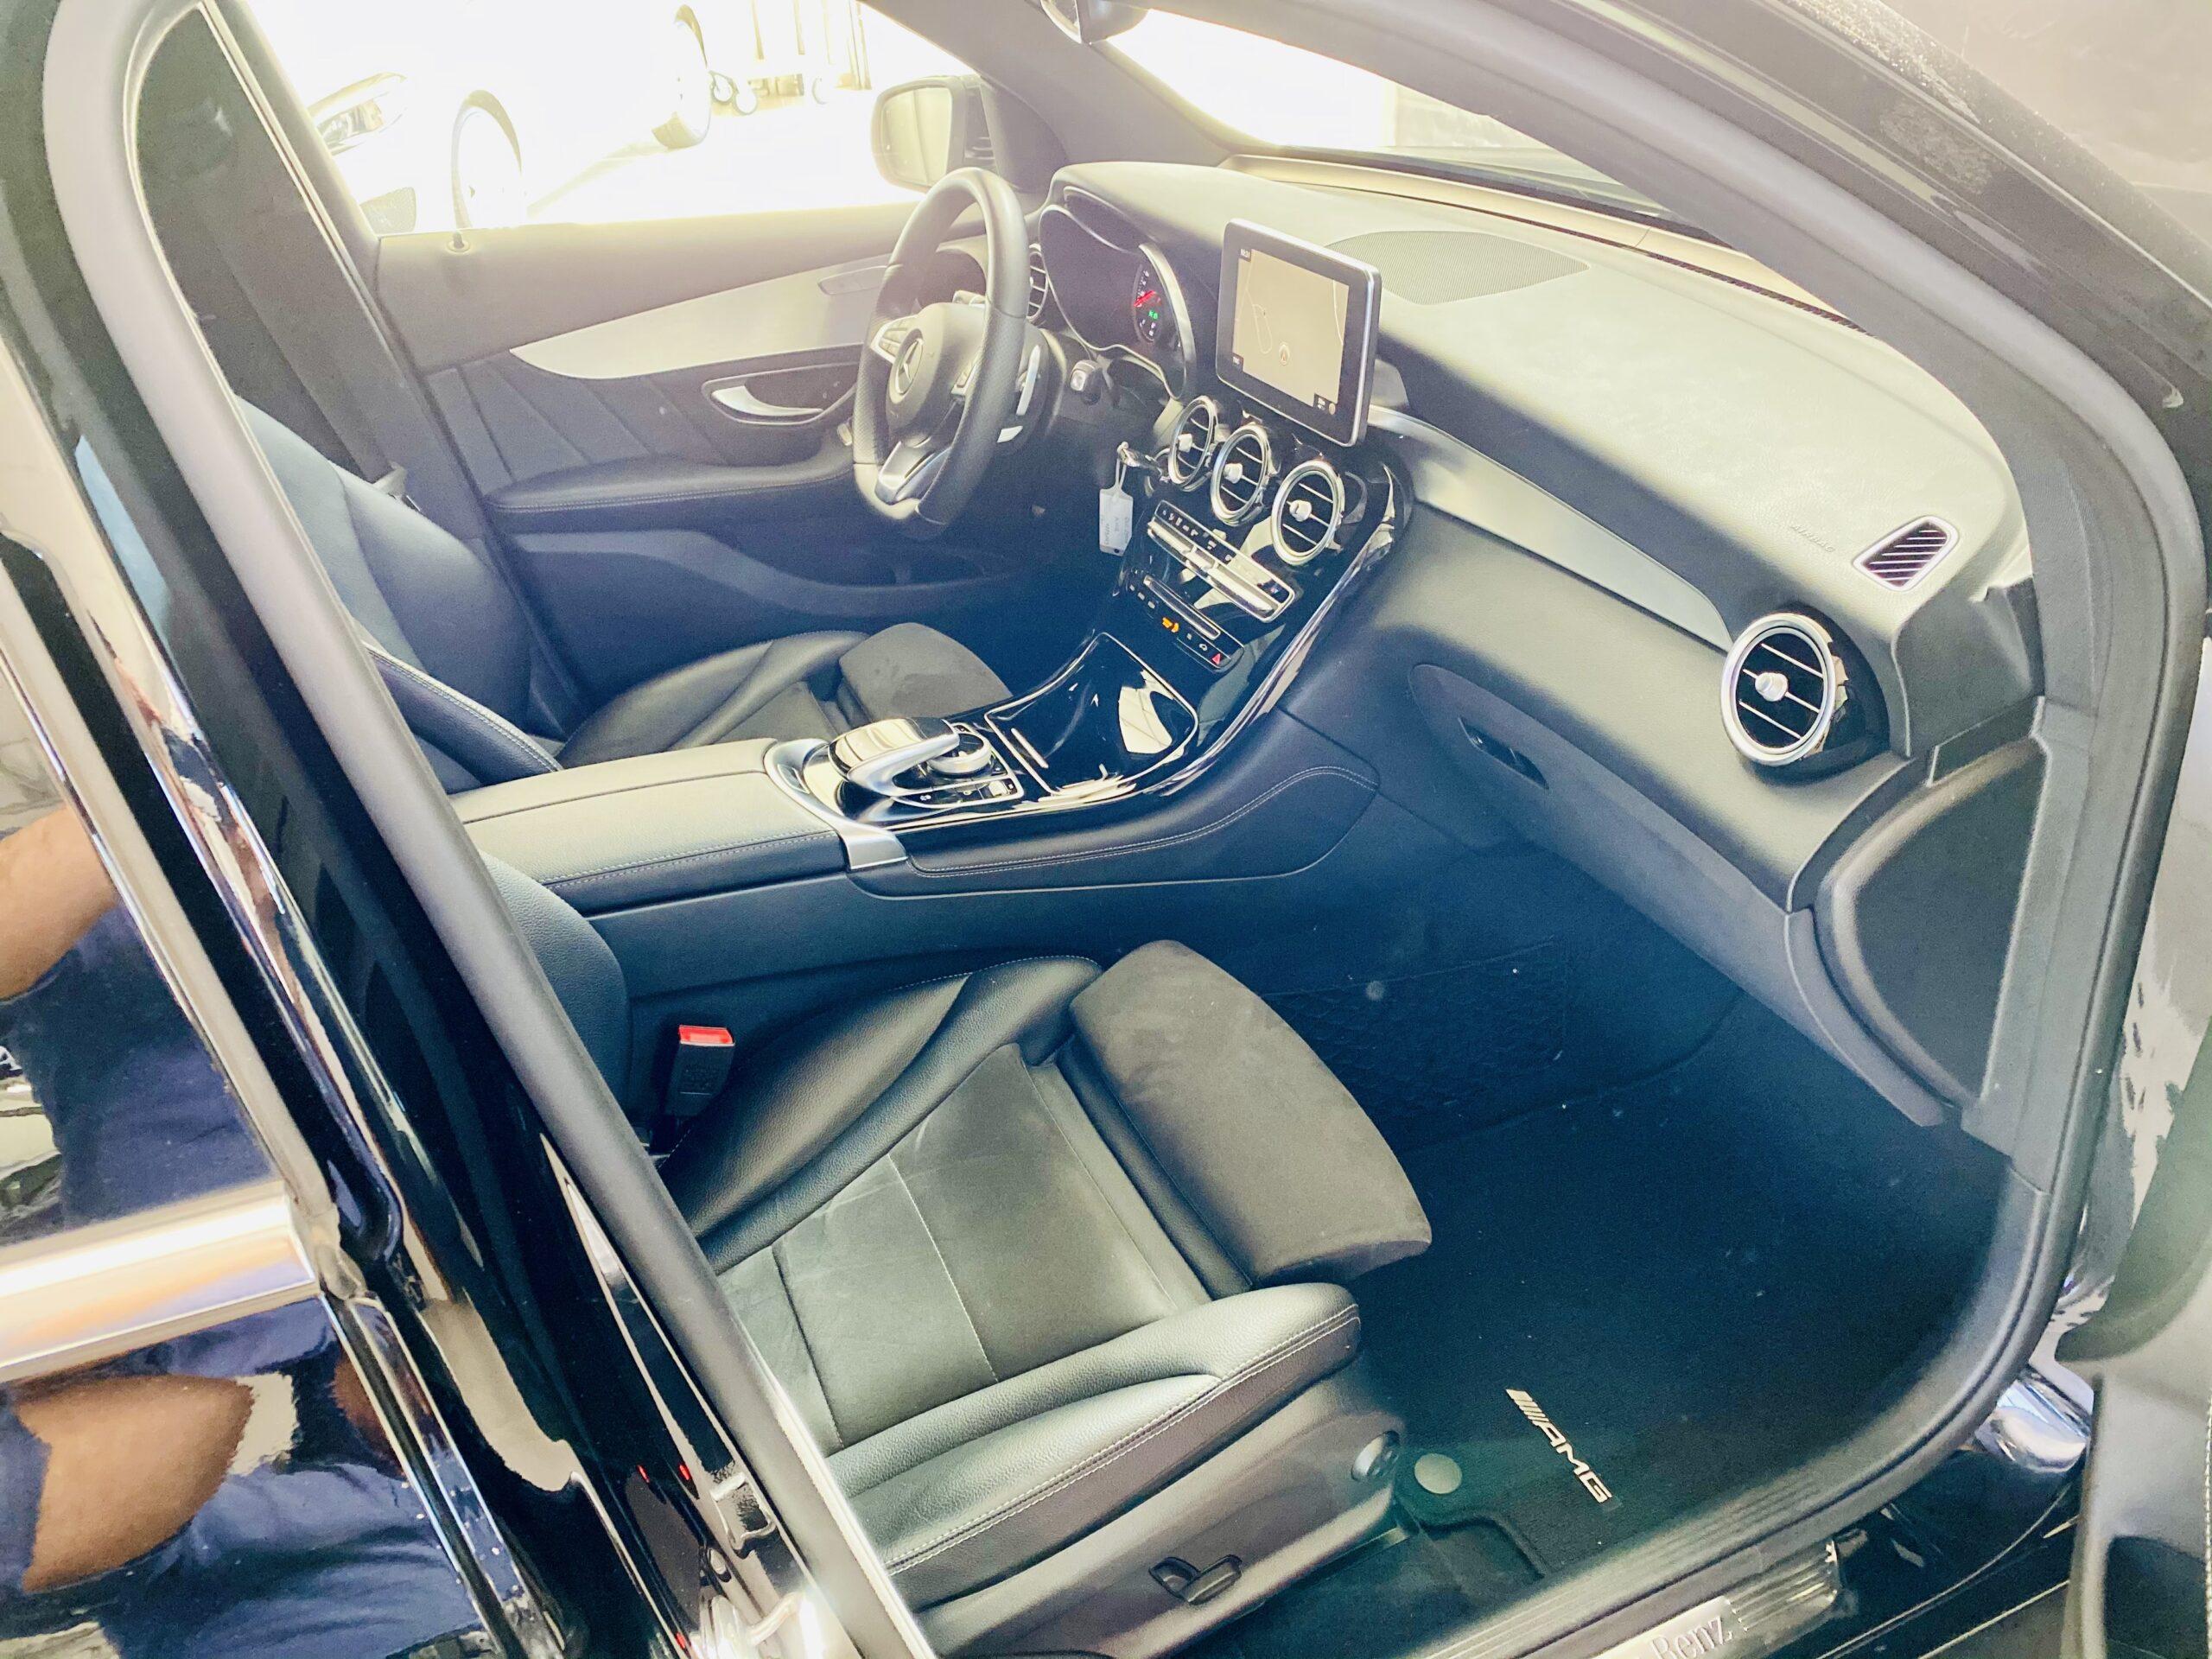 Mercedes-Benz GLC 250 d AMG Line 9G